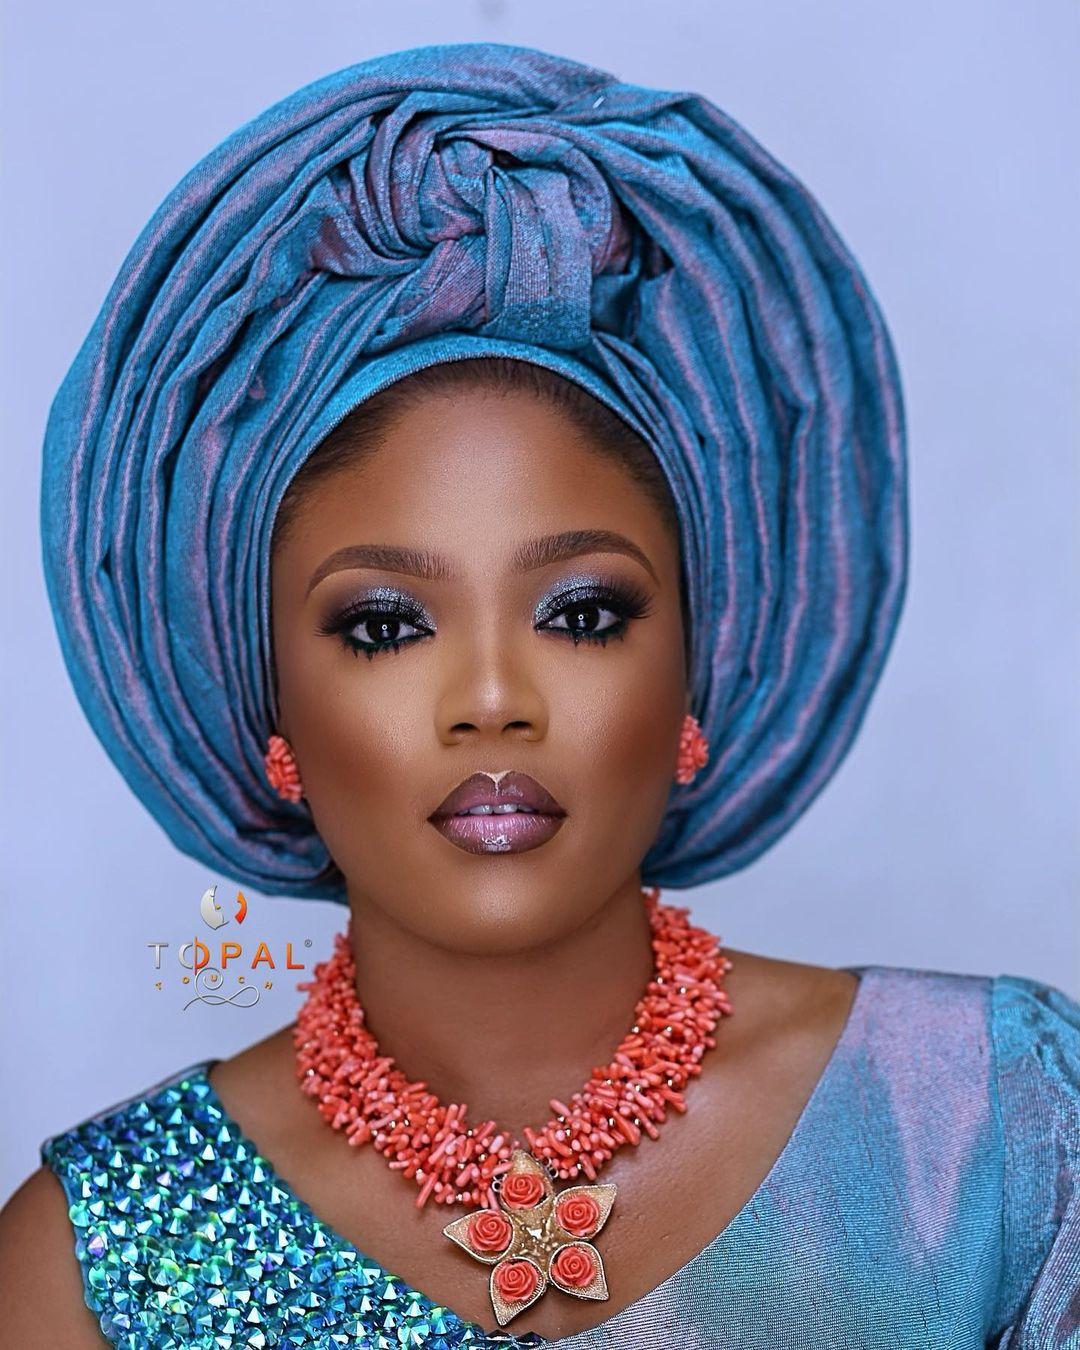 Shiny blue bridal makeup